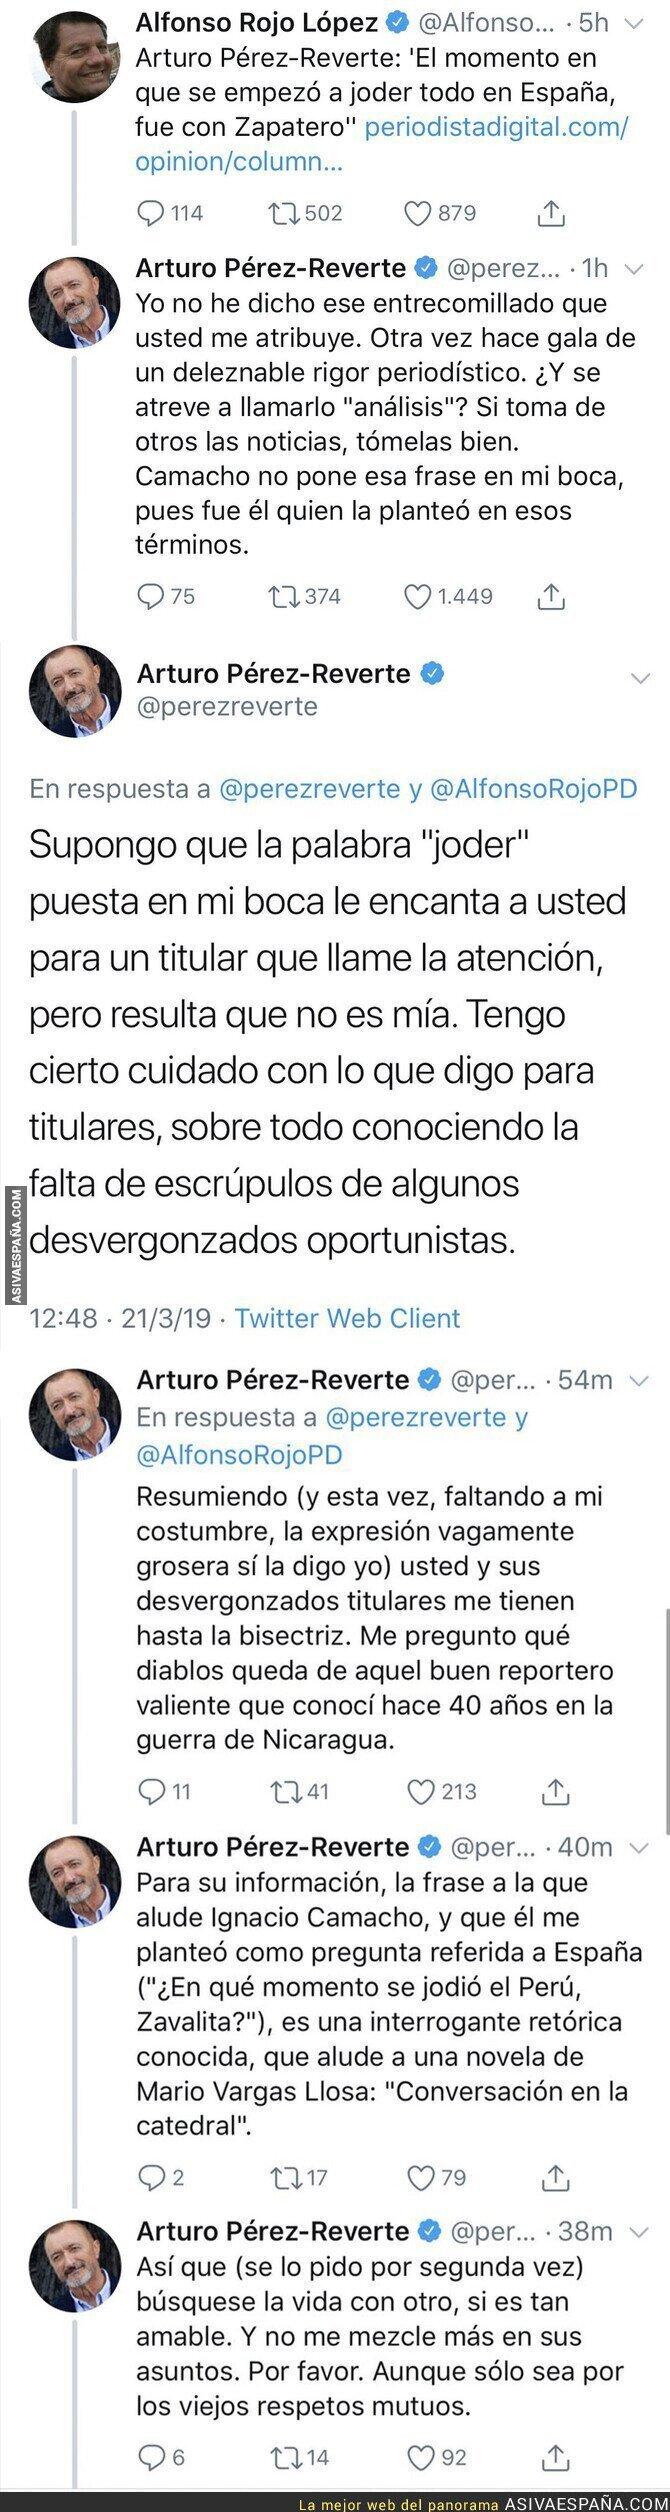 107180 - Arturo Pérez-Reverte le da un repaso monumental a Alfonso Rojo tras hacer esta noticia sobre él